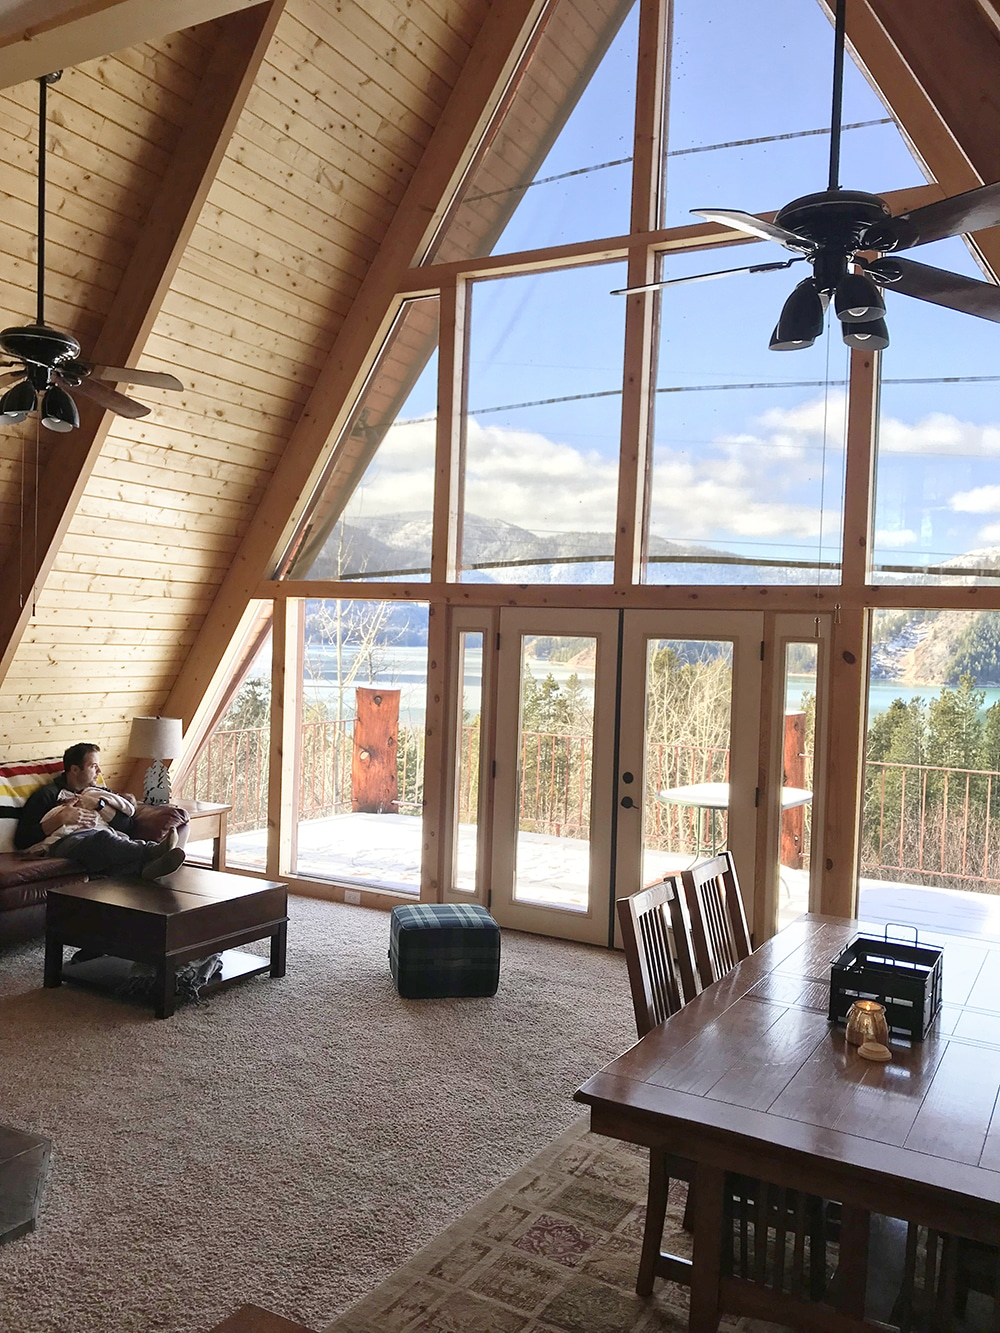 We Bought a Cabin! - Chris Loves Julia